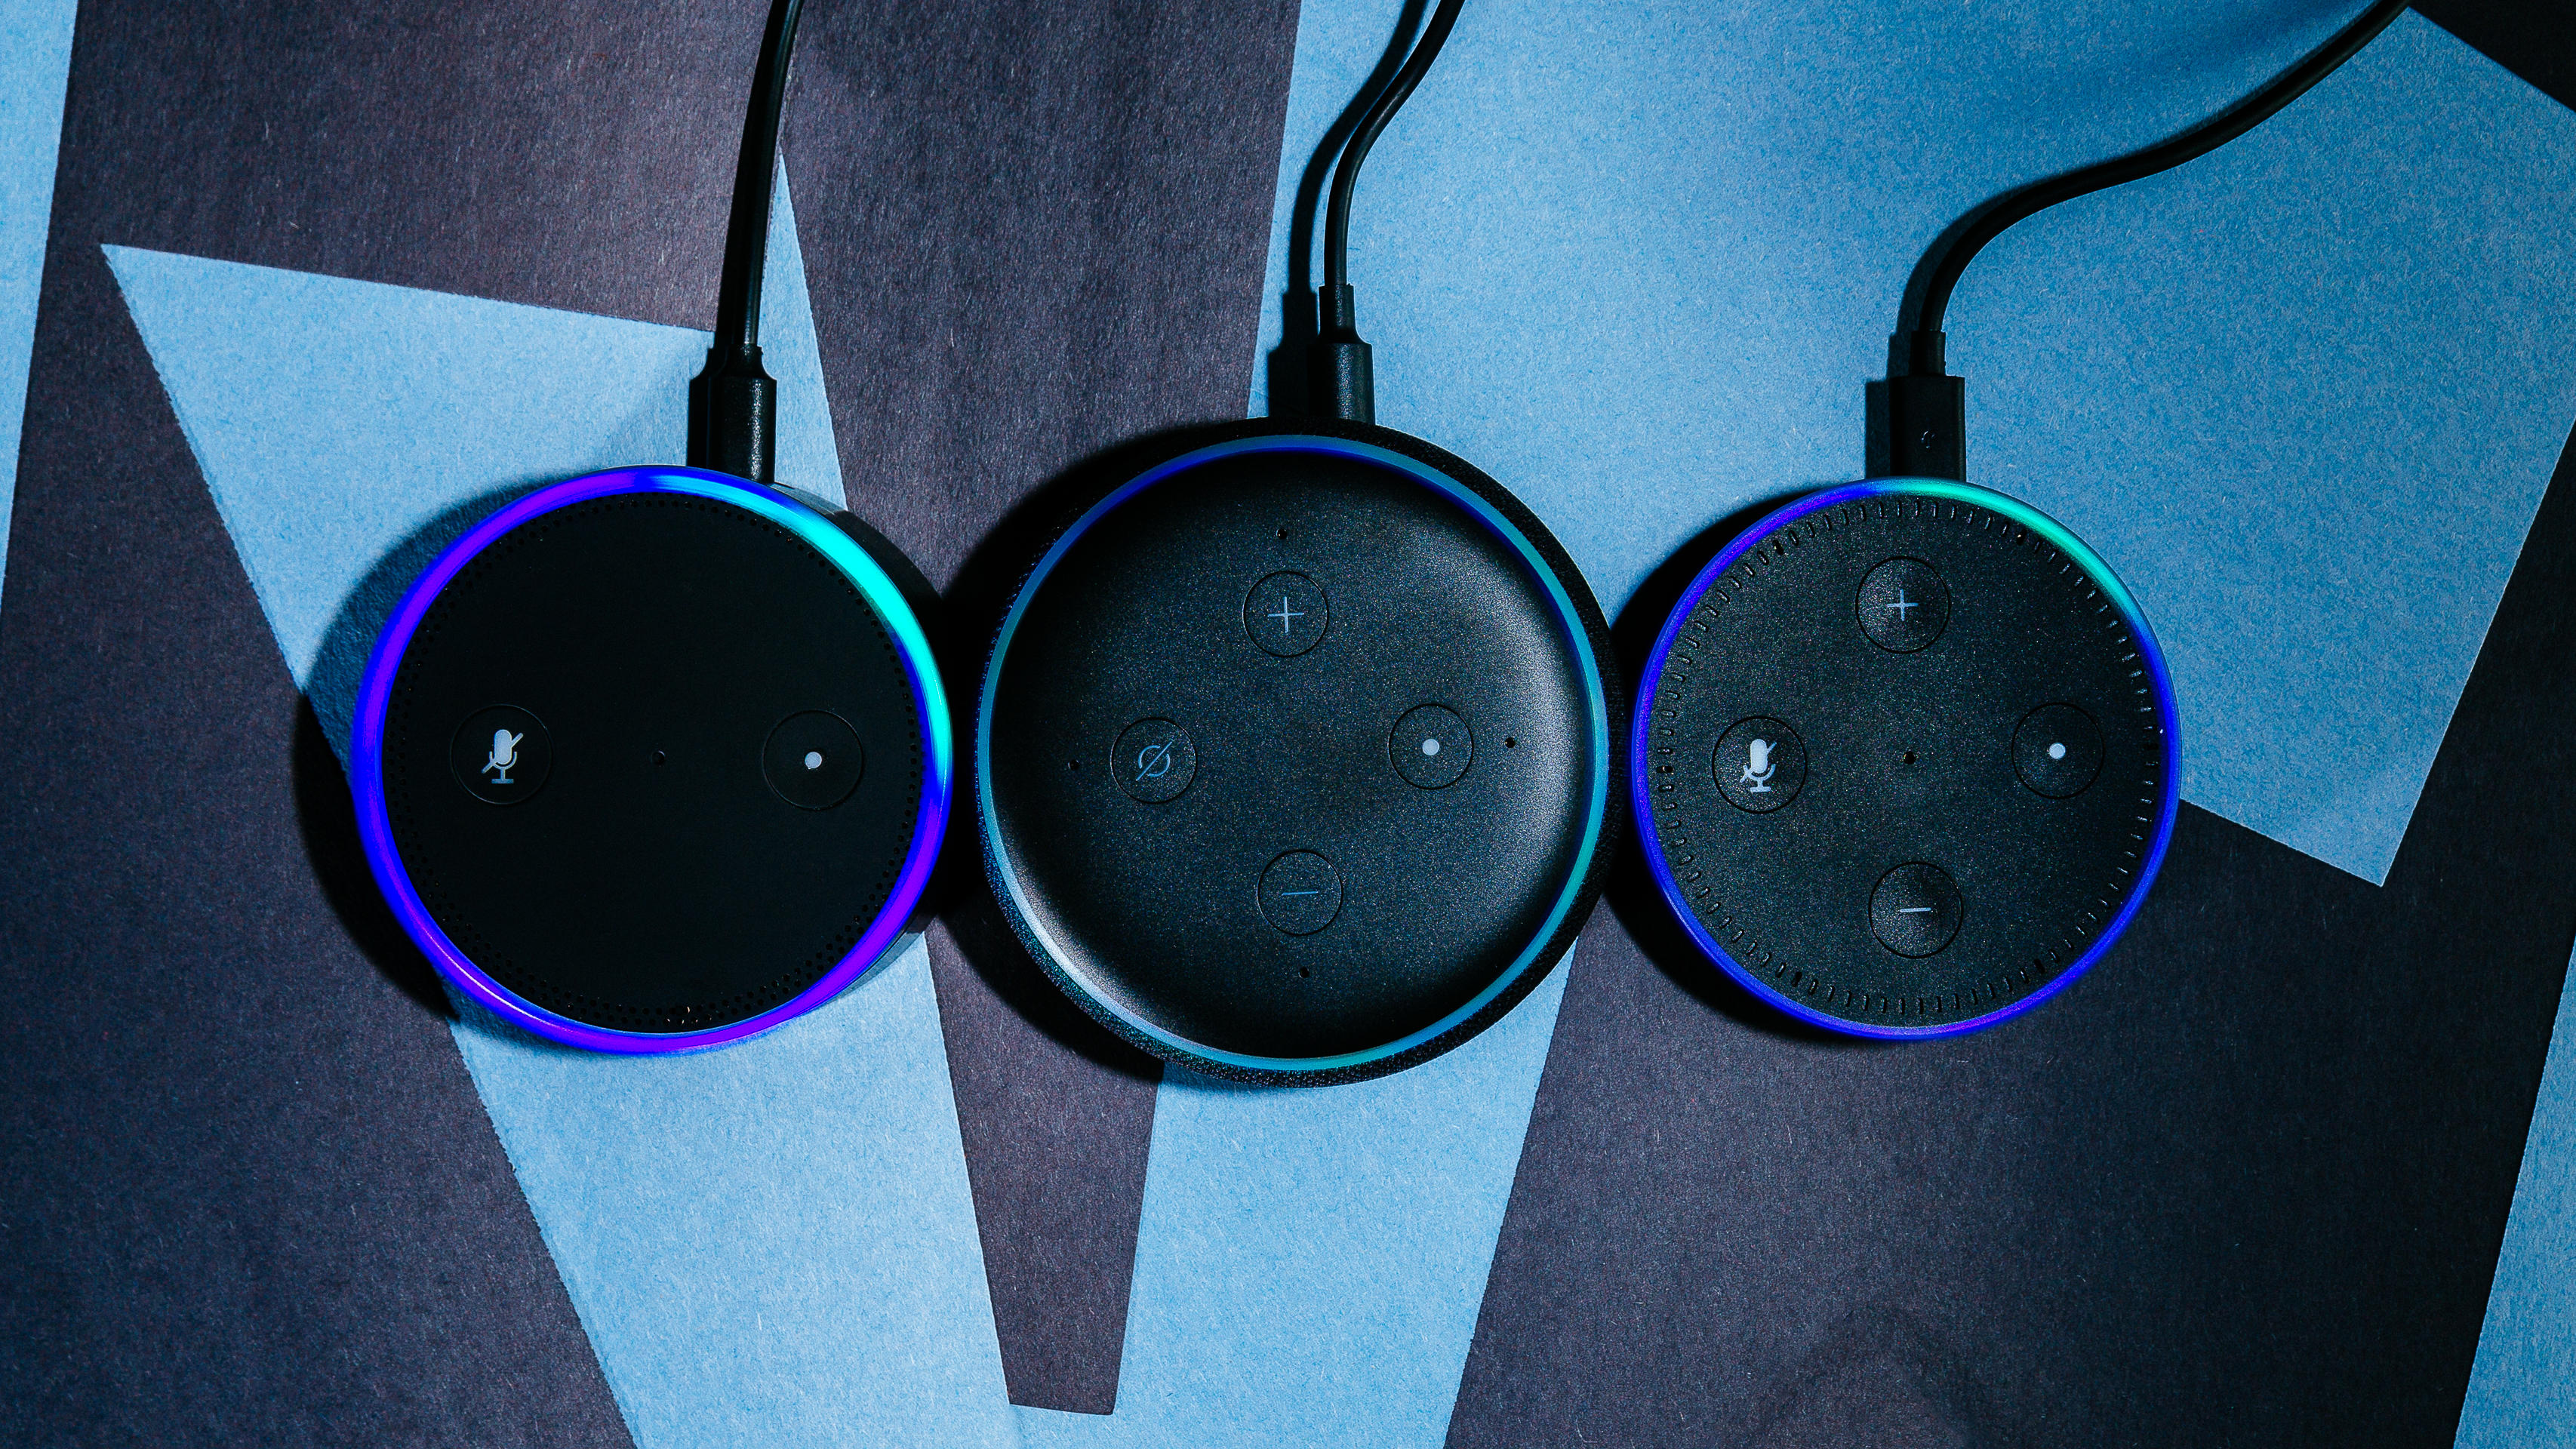 third-gen-amazon-echo-dot-product-photos-4